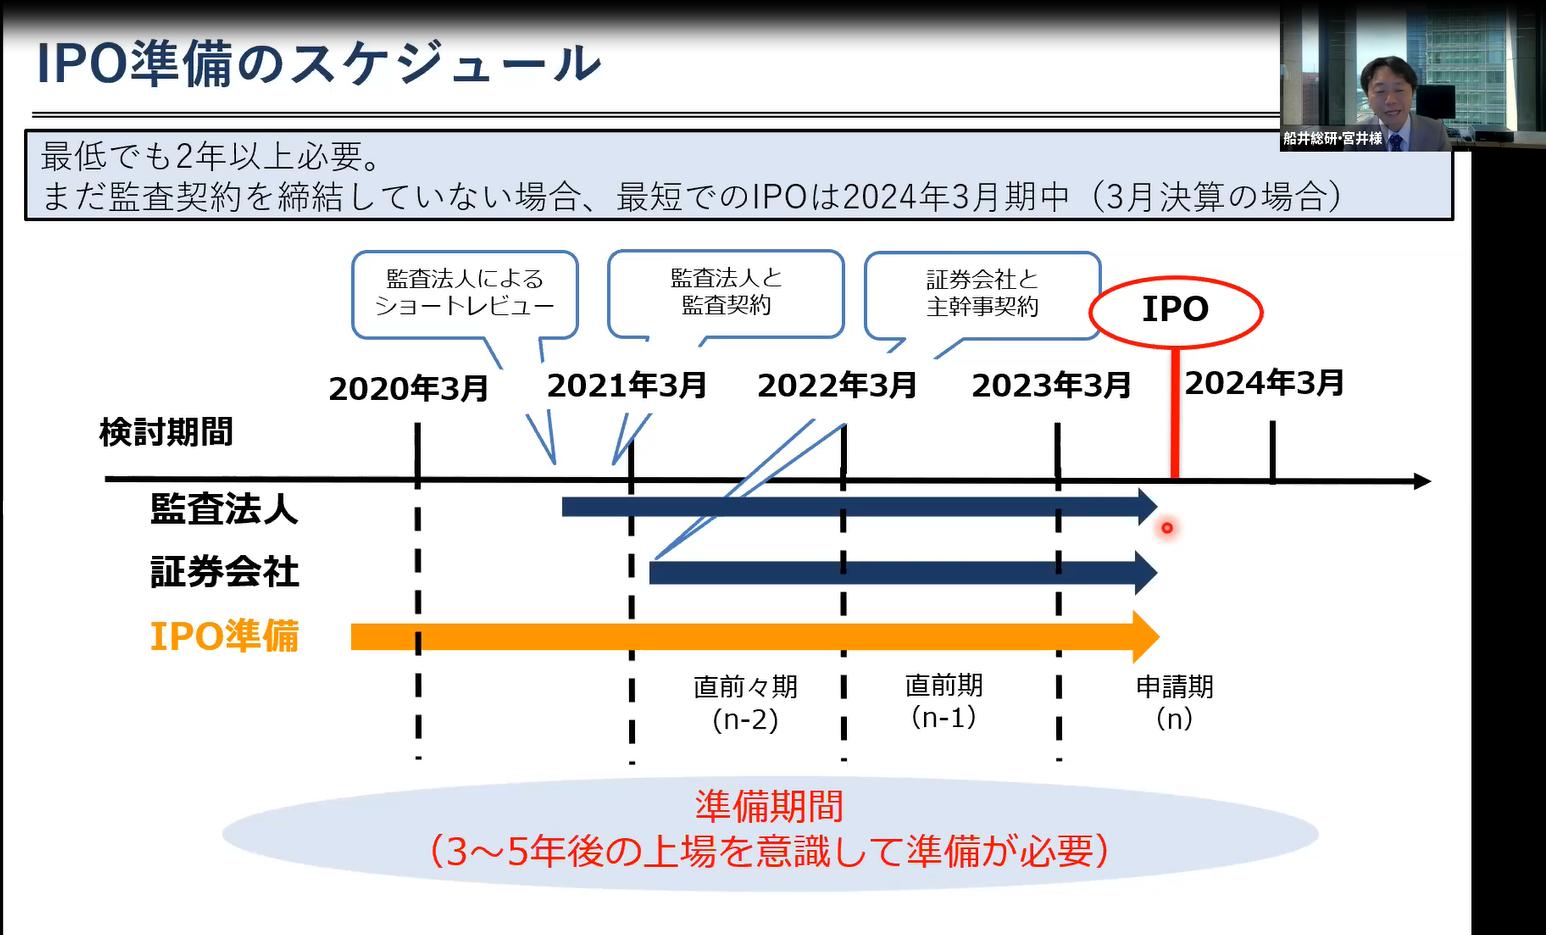 IPO準備のスケジュール